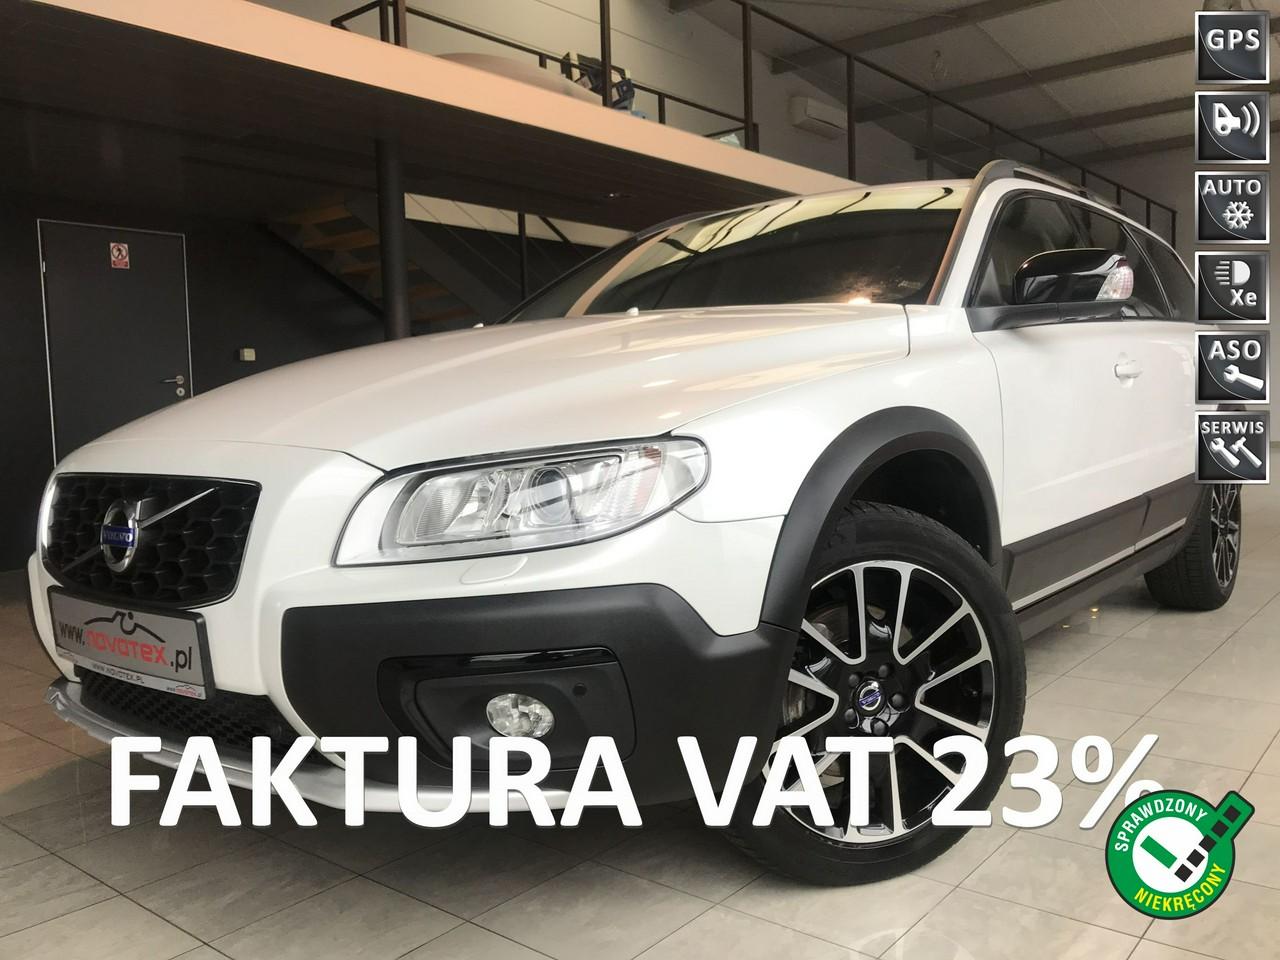 Volvo XC 70 D4*Summum*xenon*skóra*alu18*tylko 105Tkm*bezwypadek*serwis w ASO Volvo